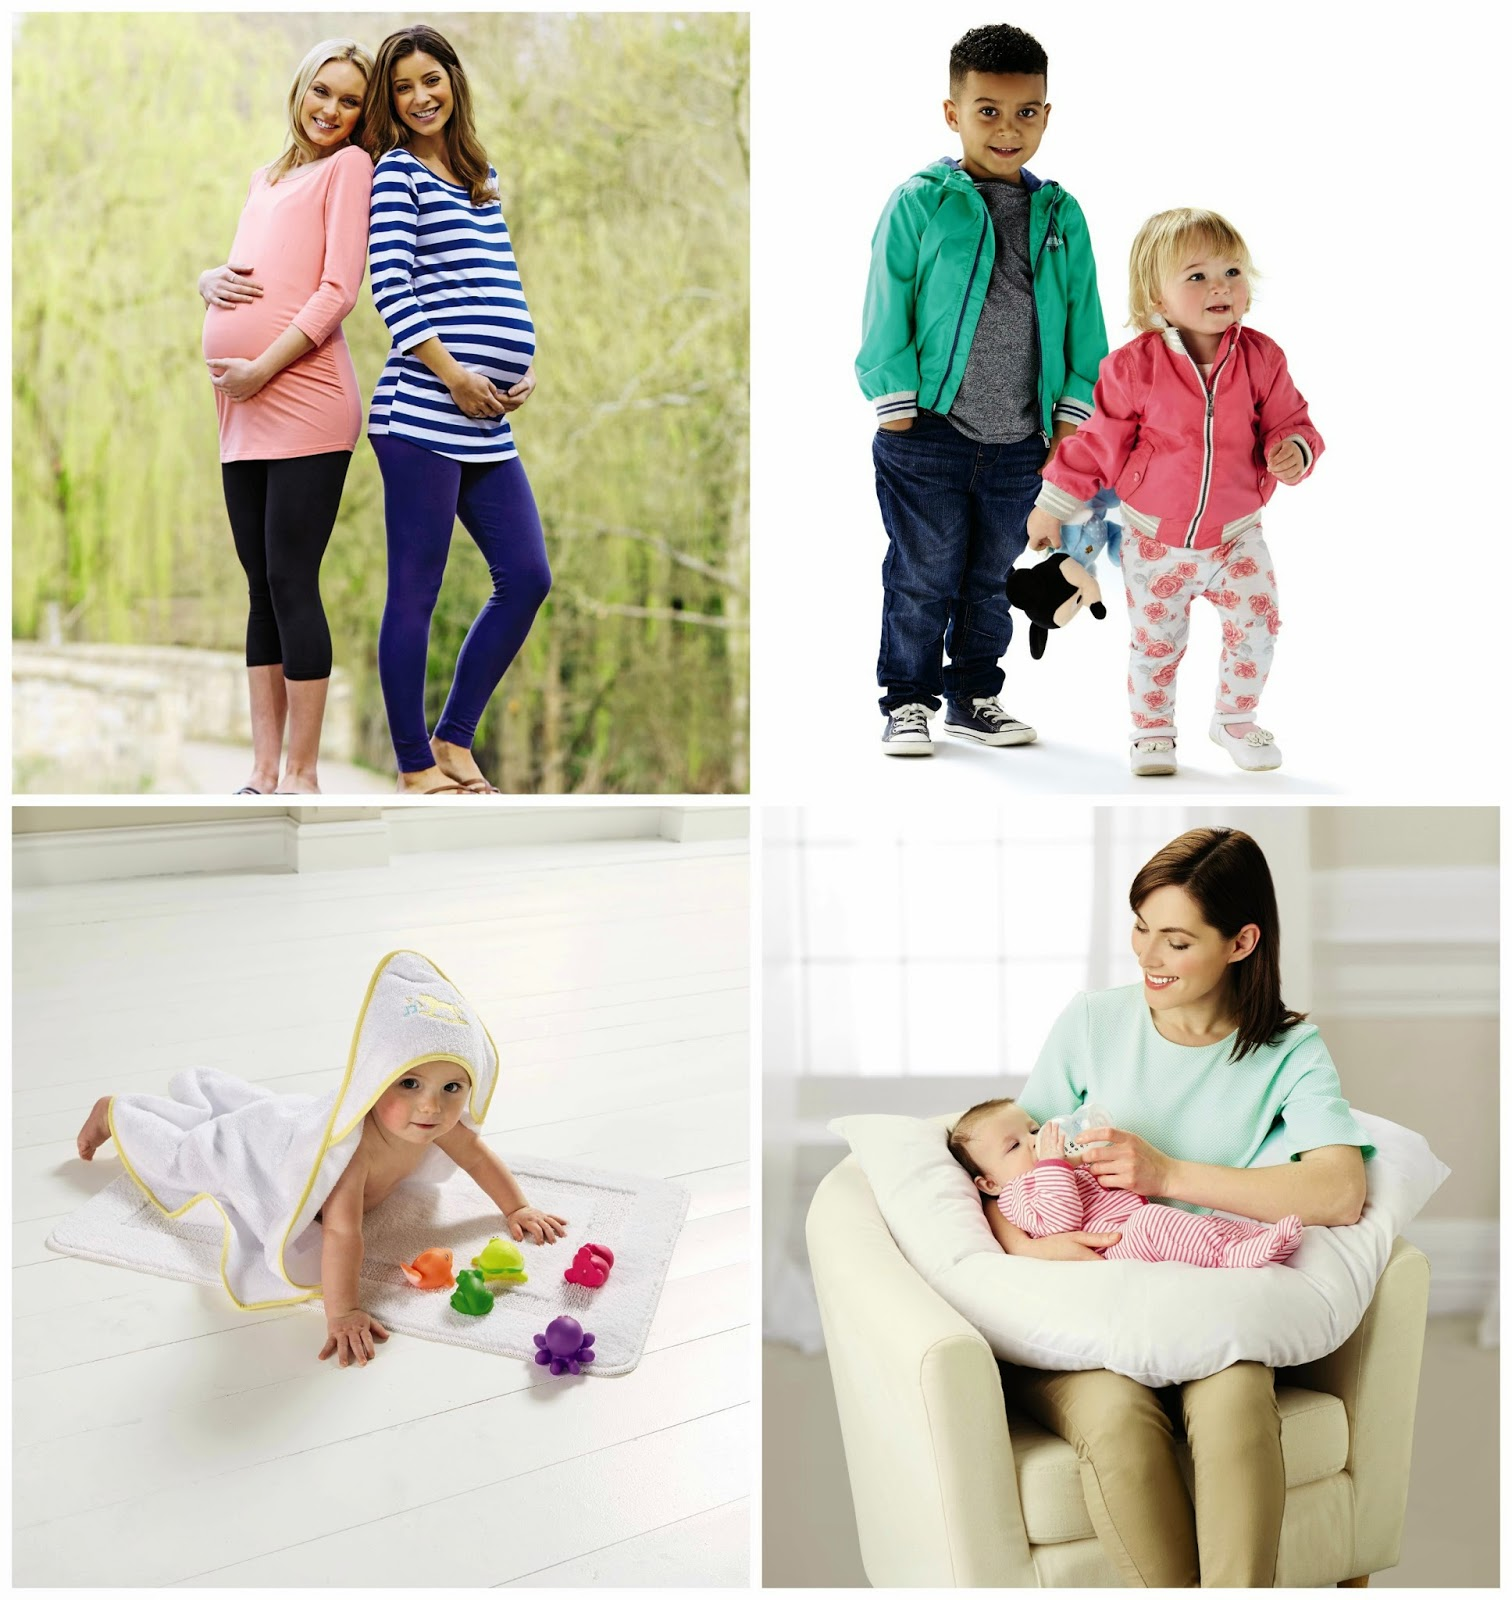 handbags to change bags aldi 39 s baby toddler event. Black Bedroom Furniture Sets. Home Design Ideas